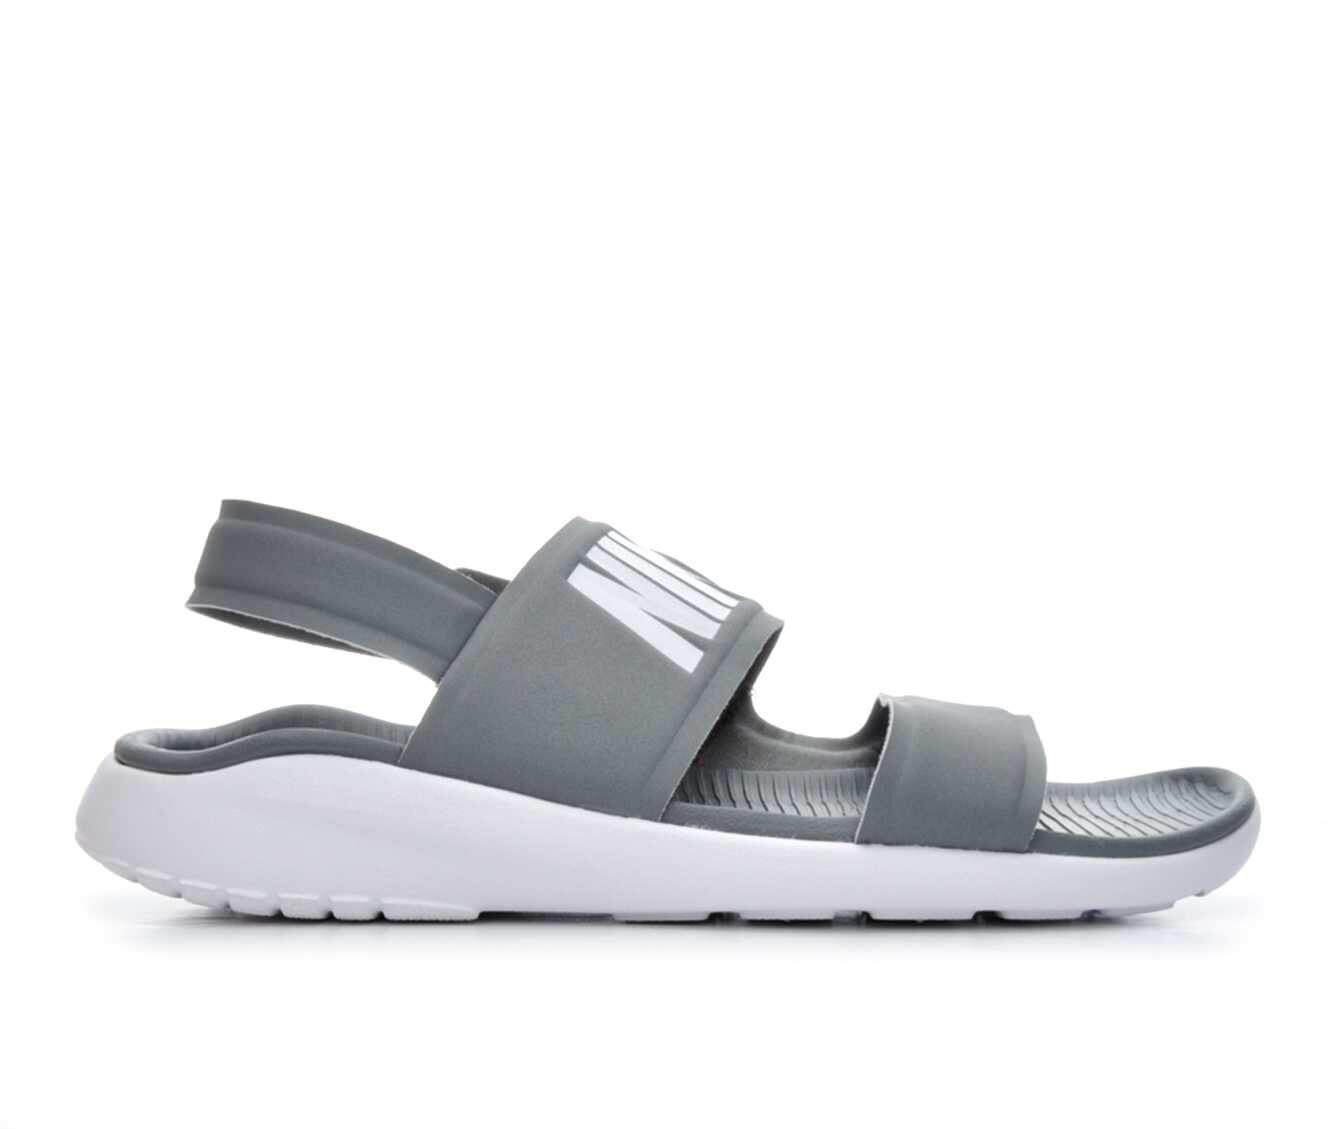 Toddler Nike Sandals Shoe Carnival